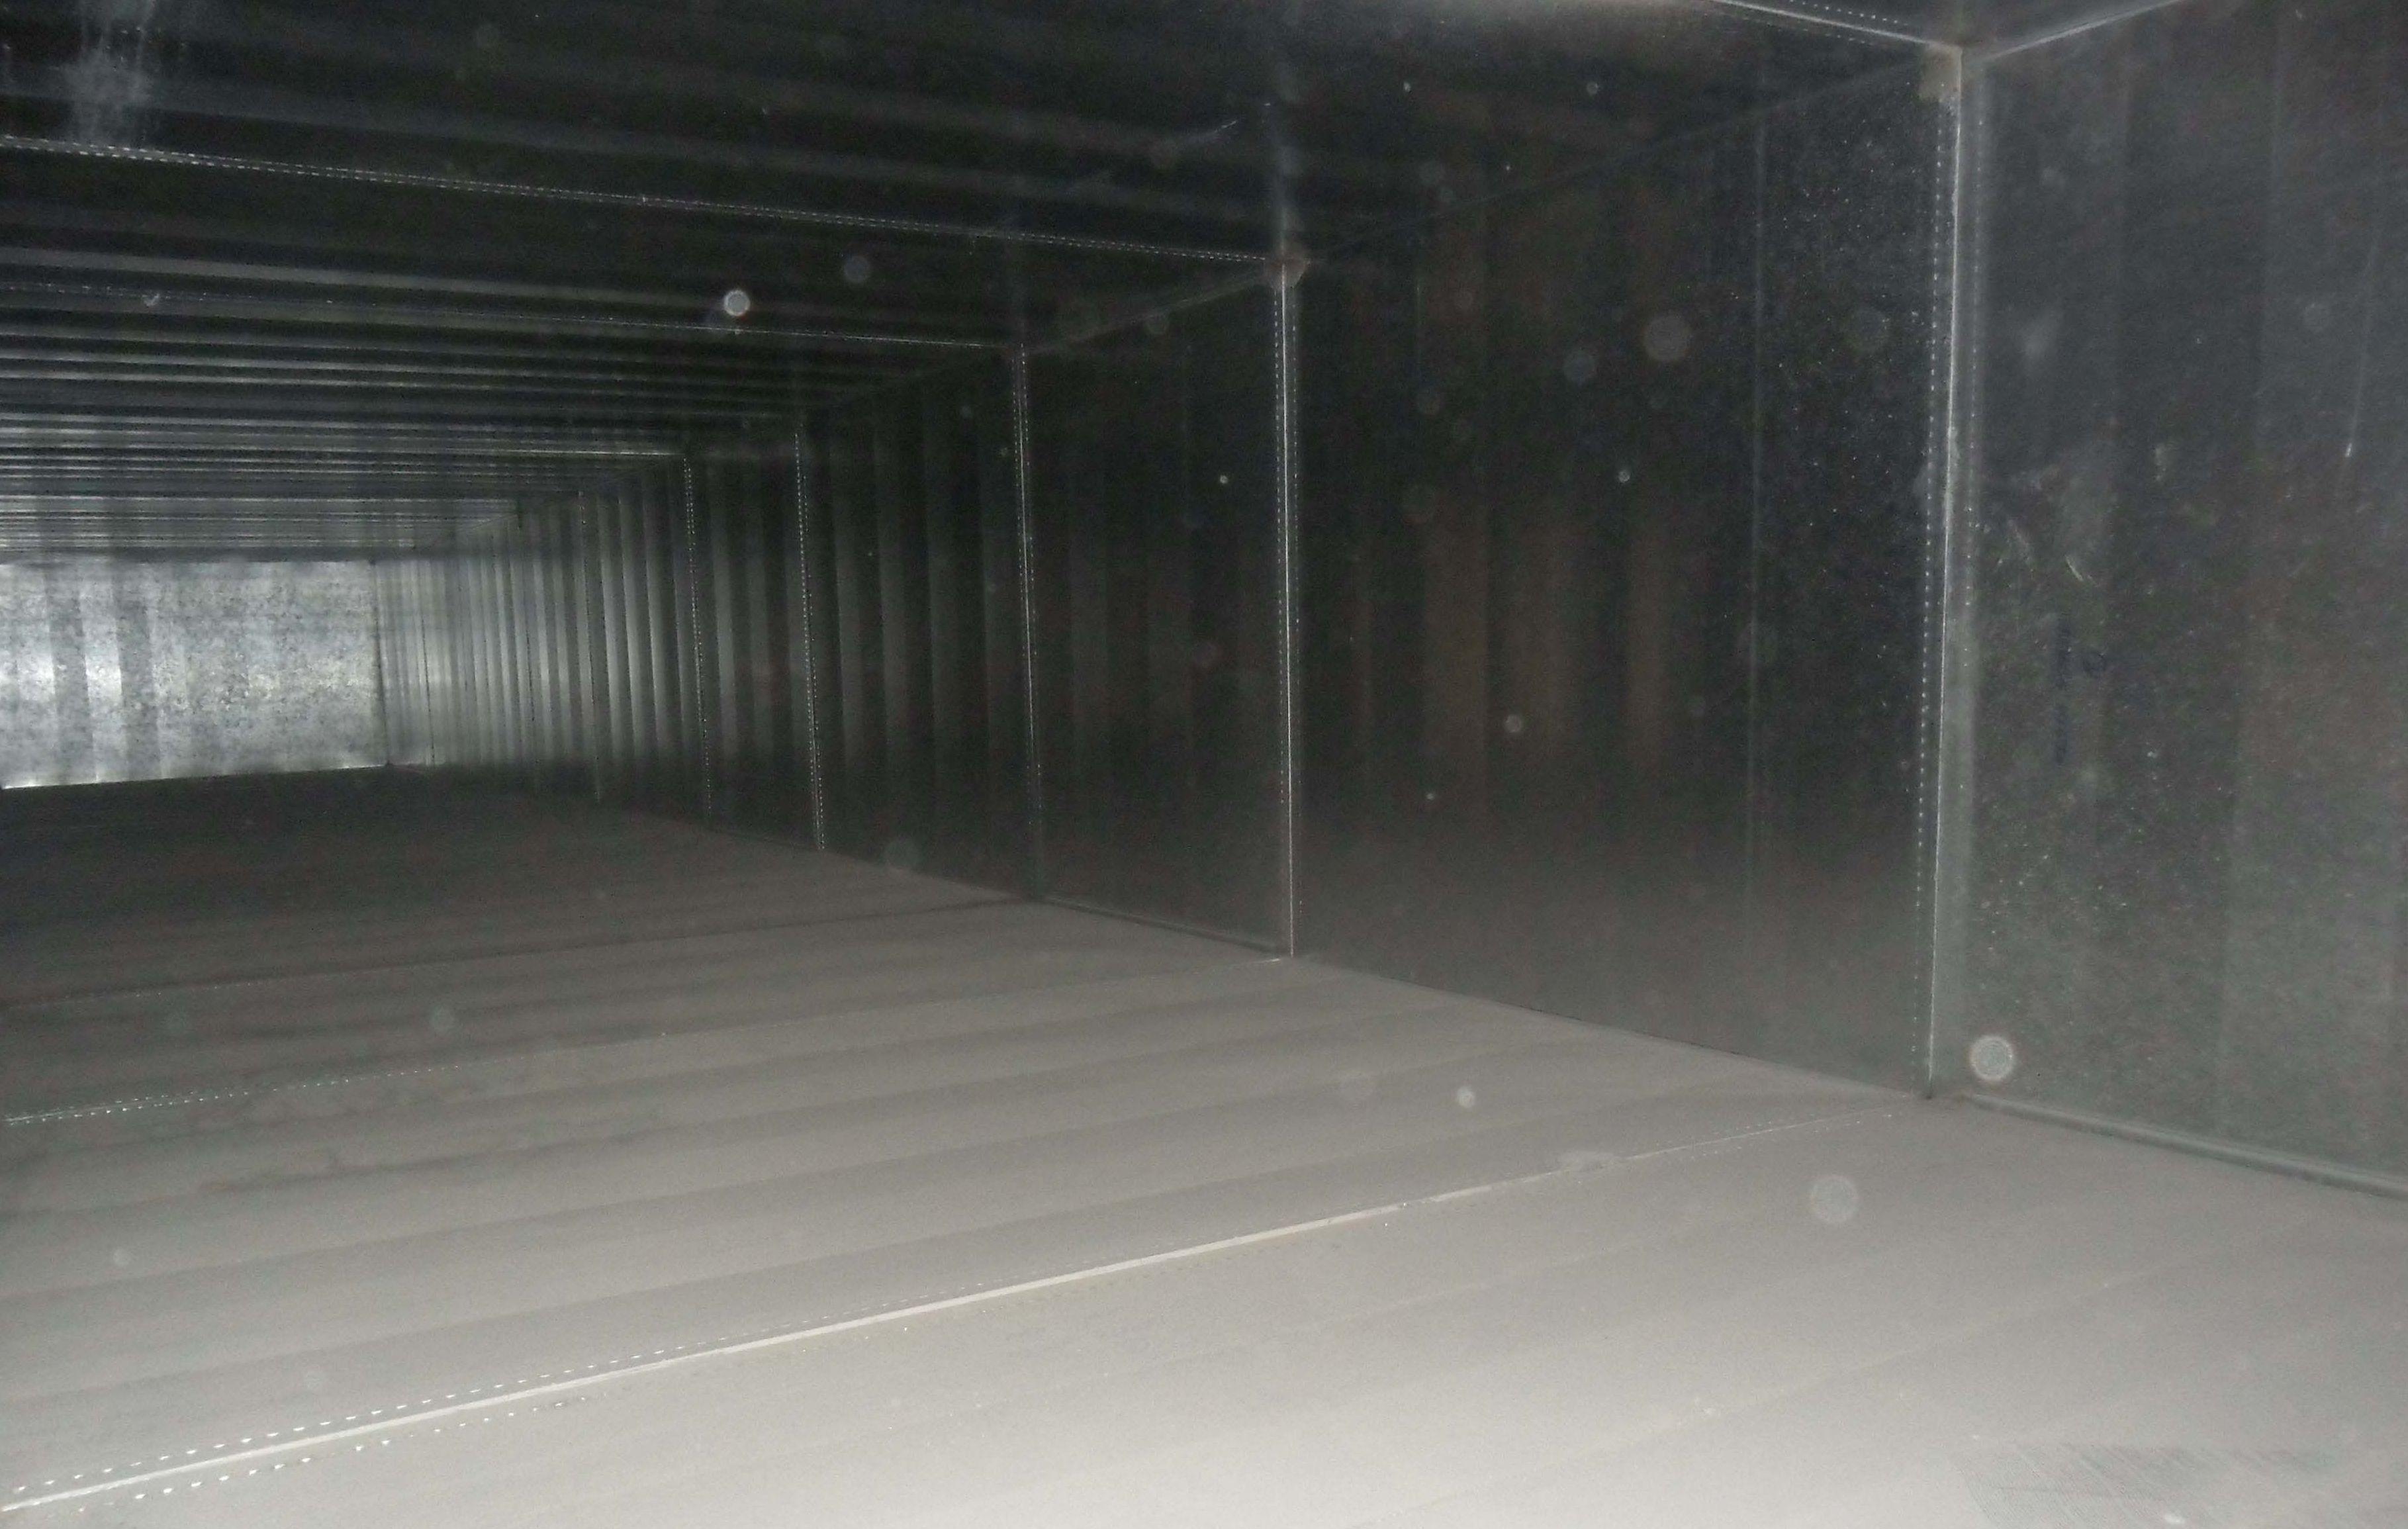 Interior de conductos de climatización